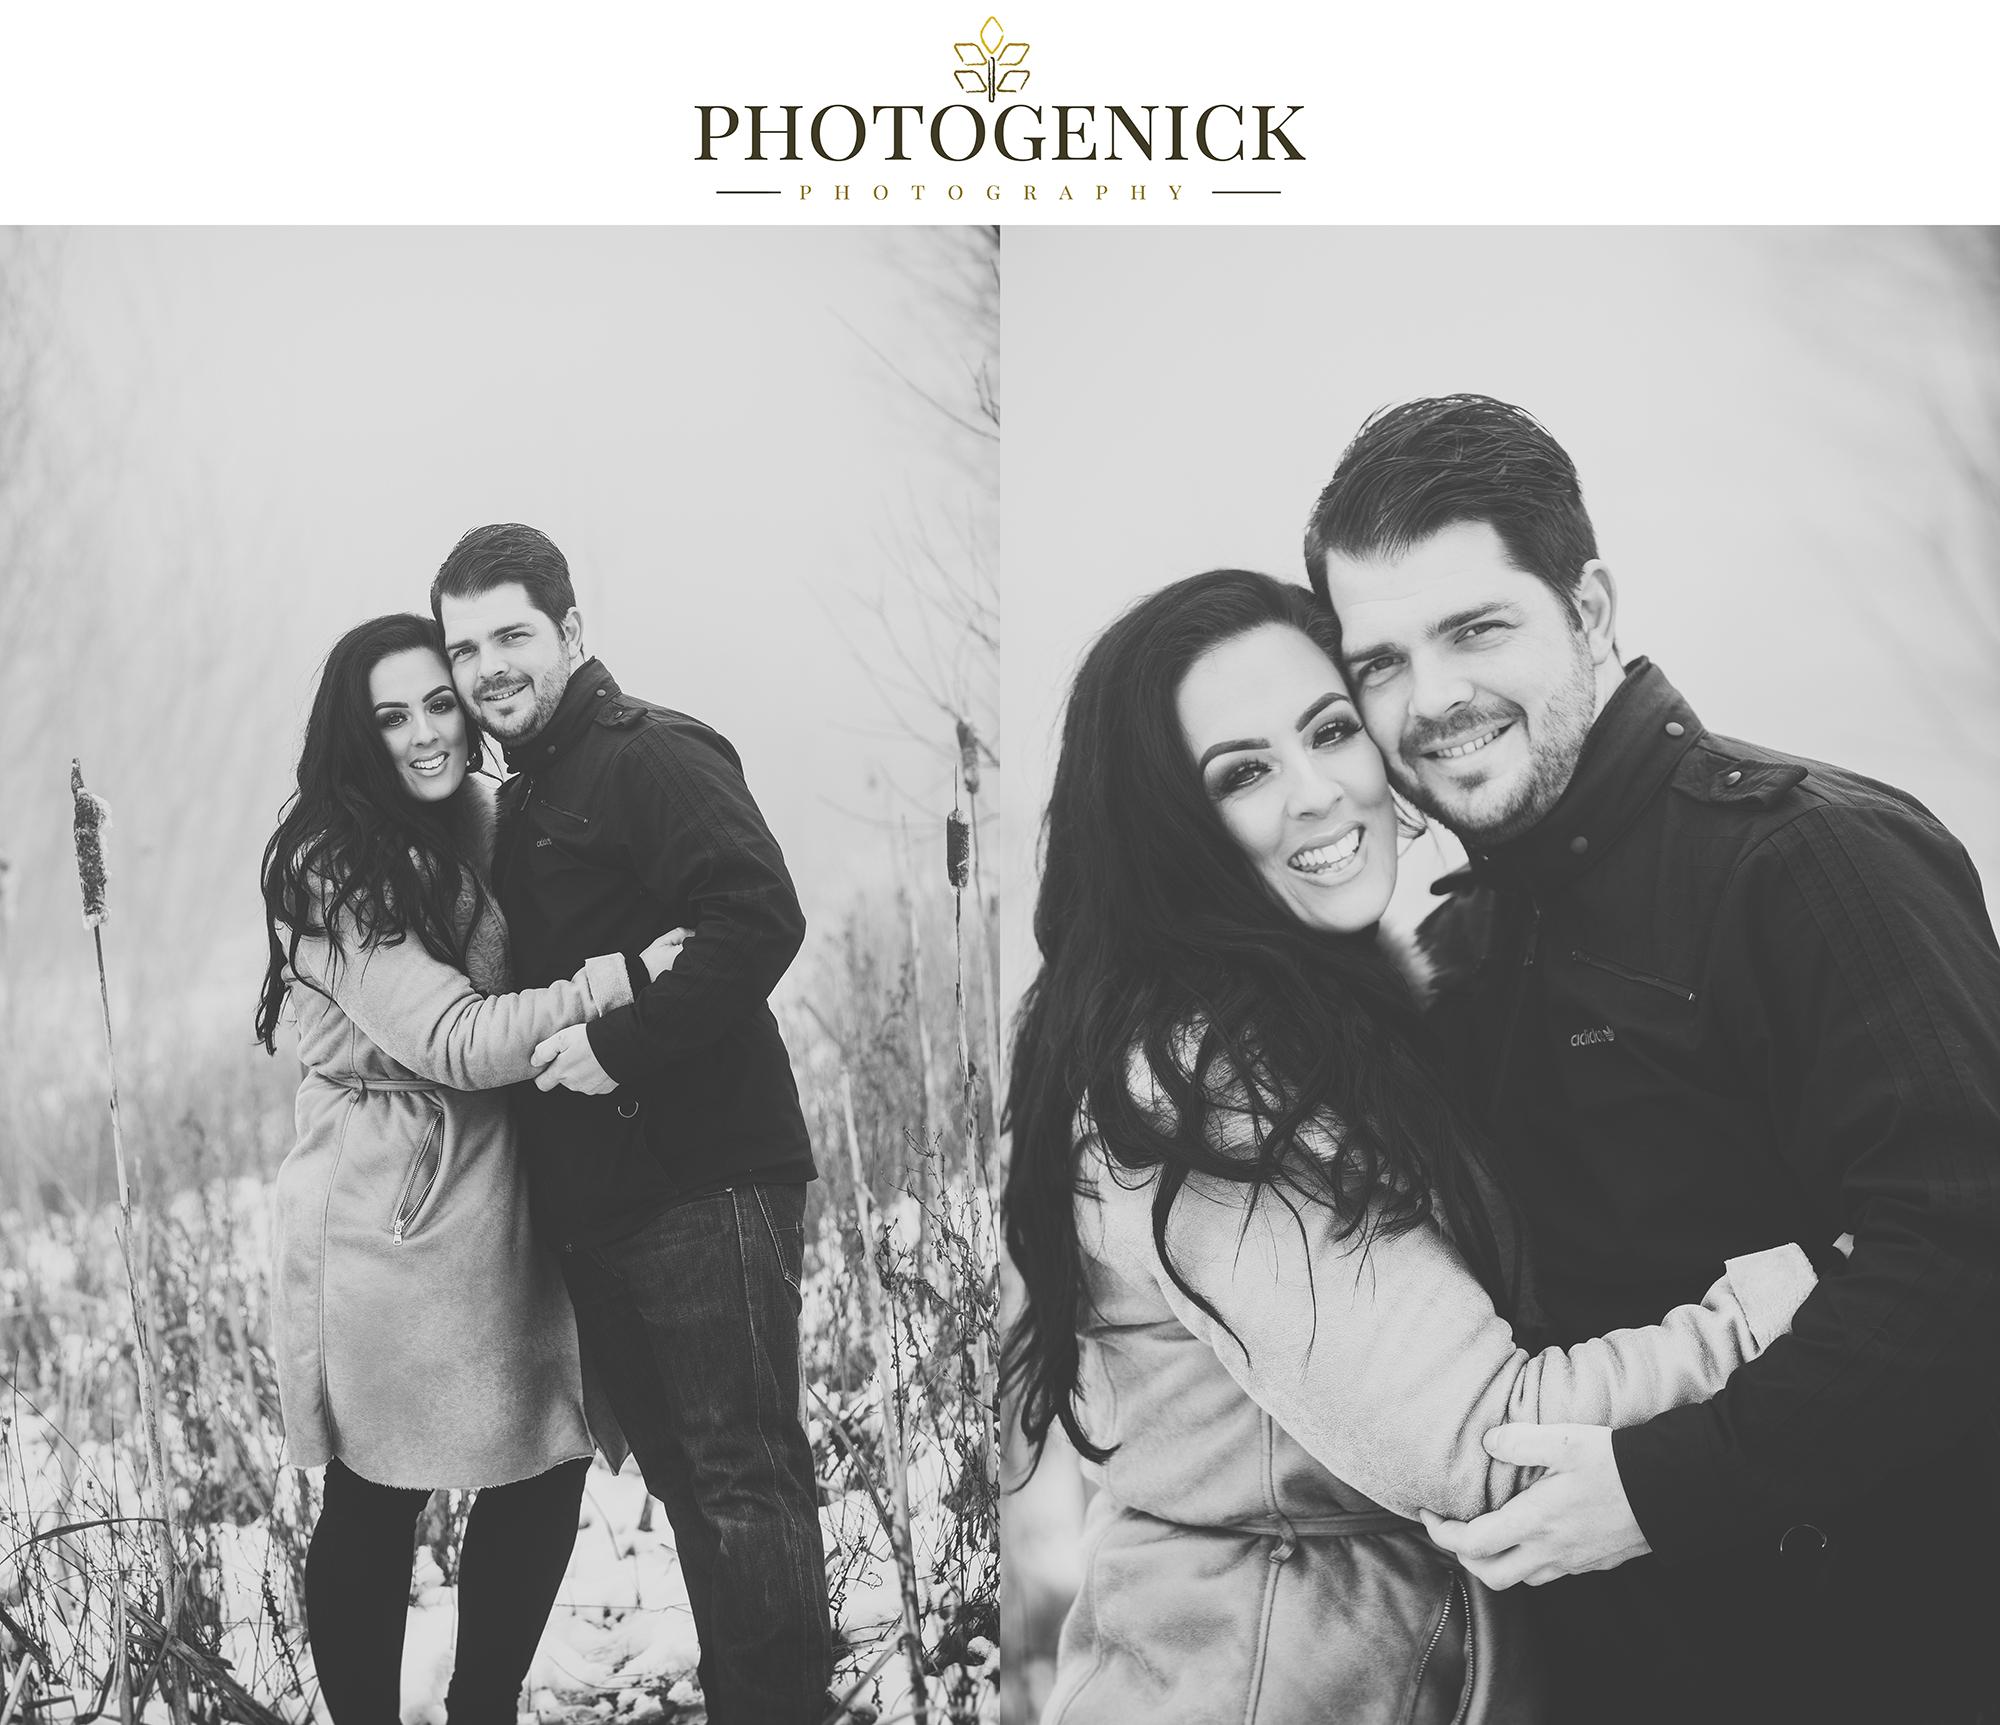 wedding photographers in rotherham.jpg